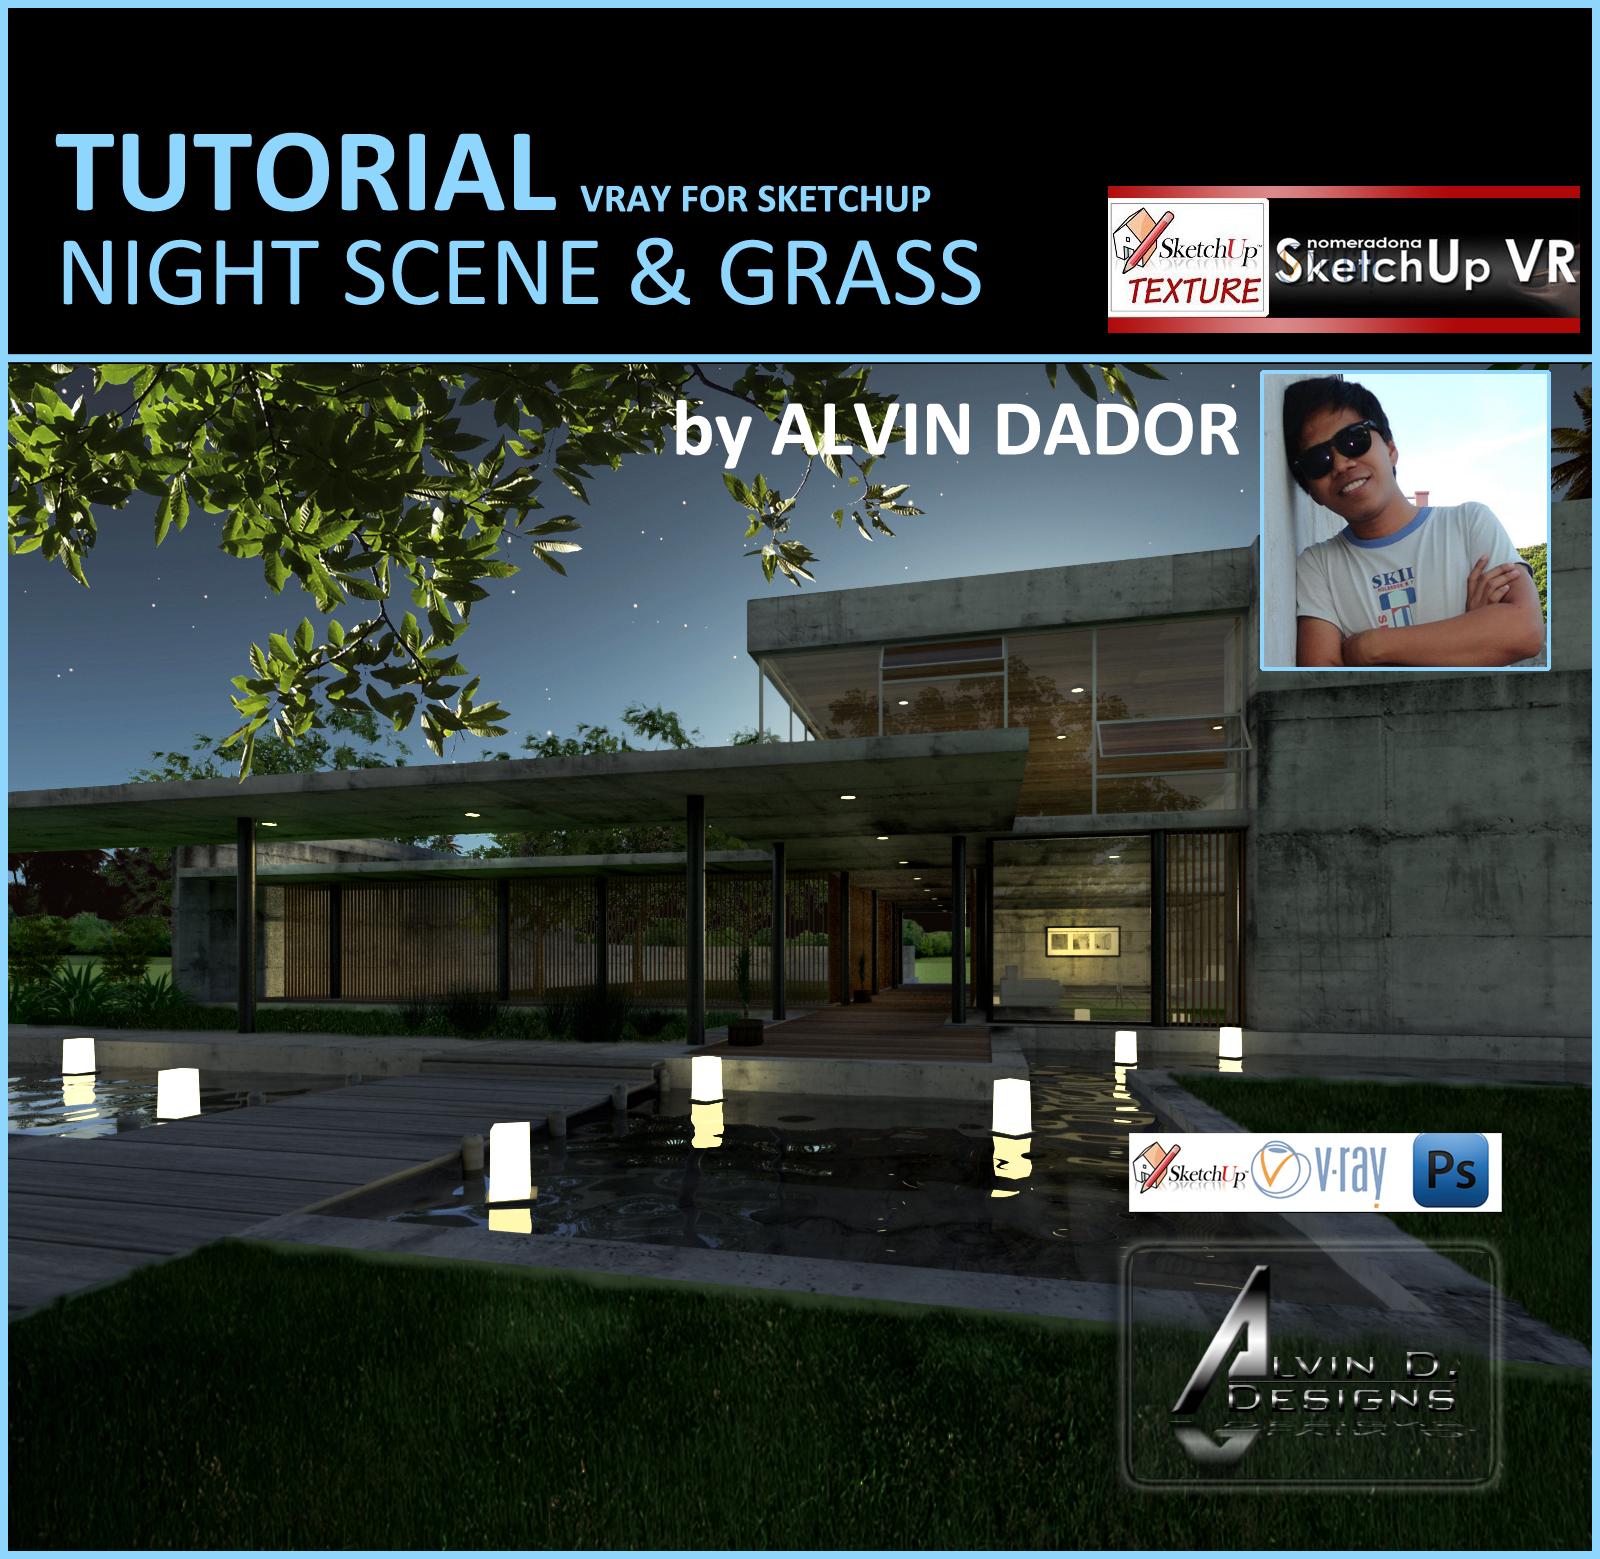 Vray Tutorial Exterior Night Scene | скетч апп | Pinterest | Scene And  Tutorials